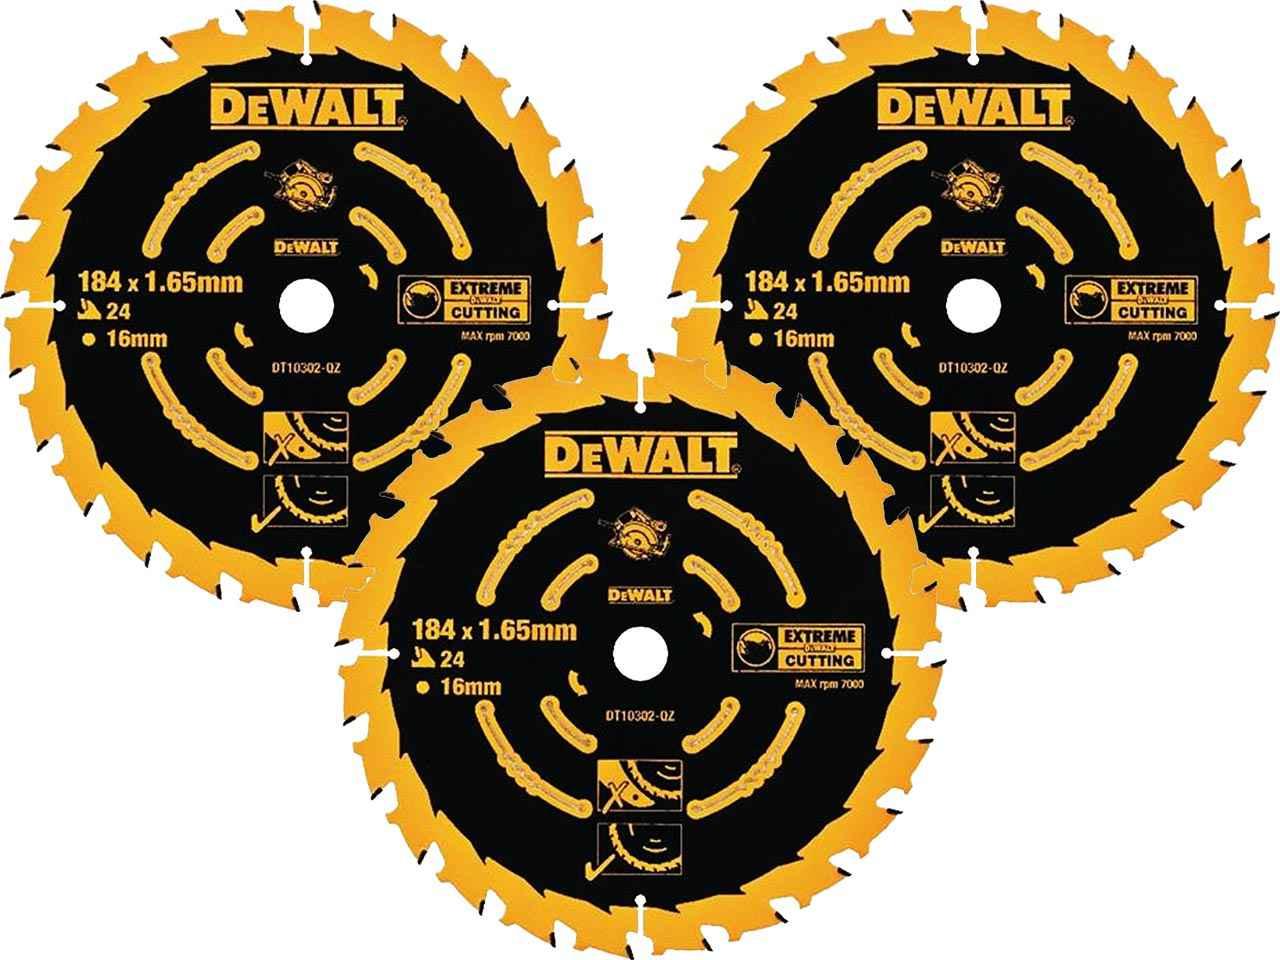 Dewalt_DT10302x3.jpg